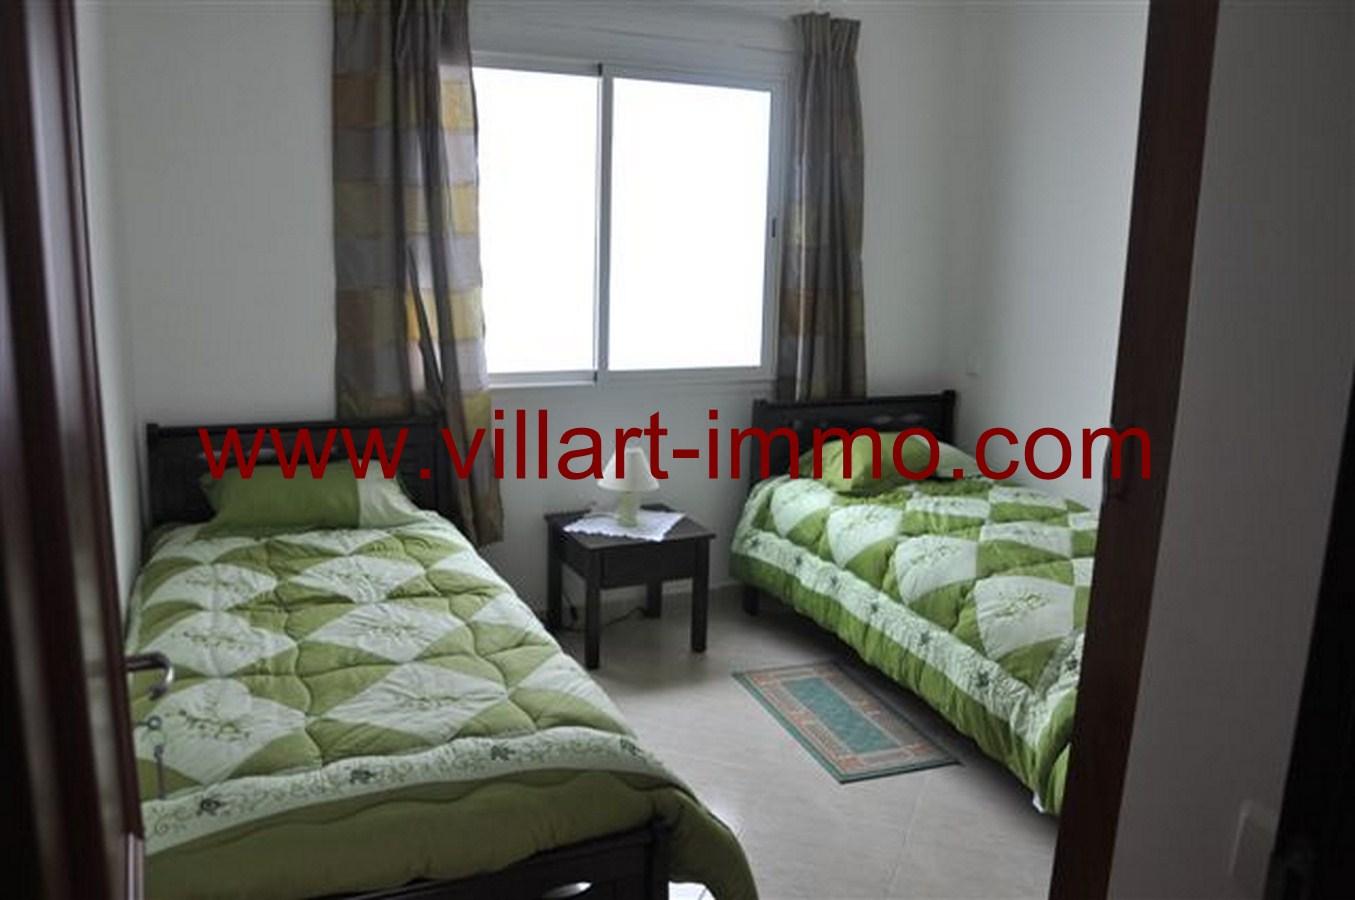 6-Vente-Appartement-Tanger-Route-de-Rabat-Chambre 2-VA521-Villart Immo